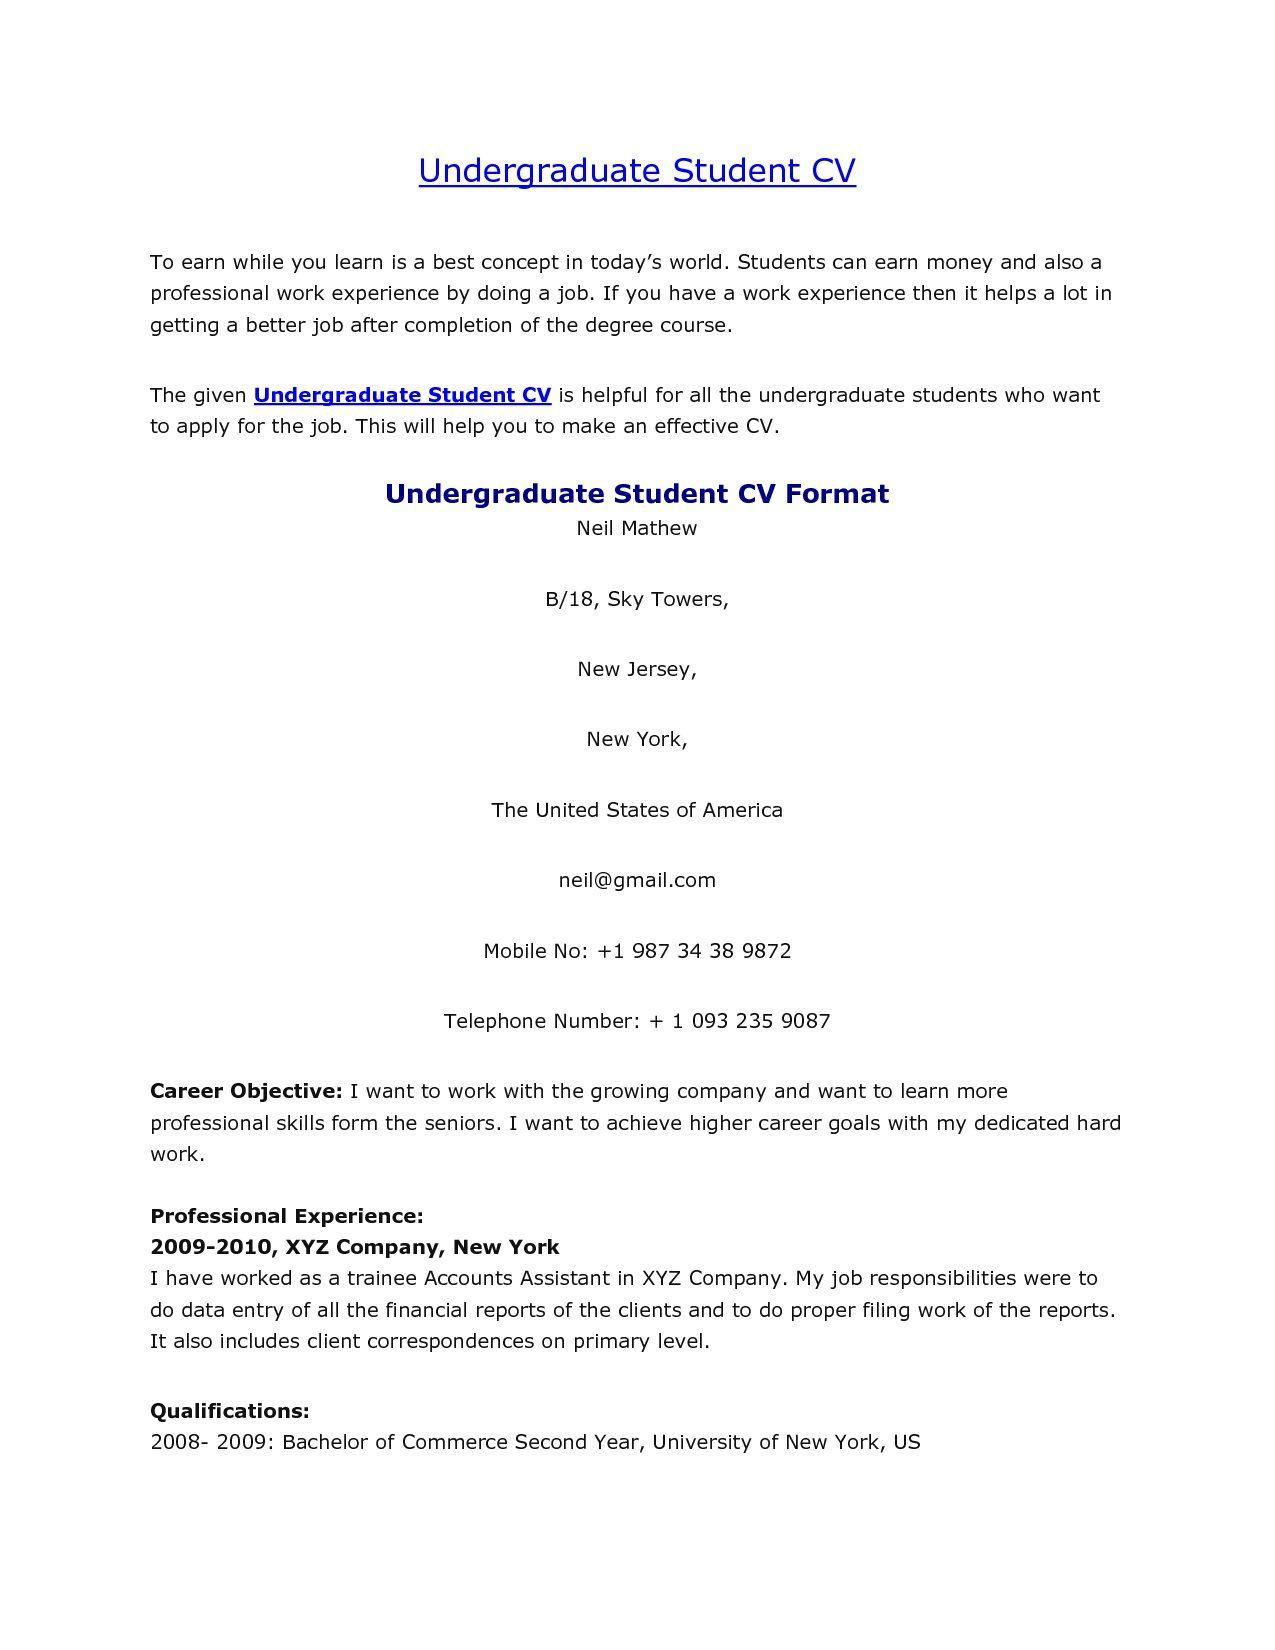 004 Rare Undergraduate Student Cv Template Sample  Pdf DownloadFull